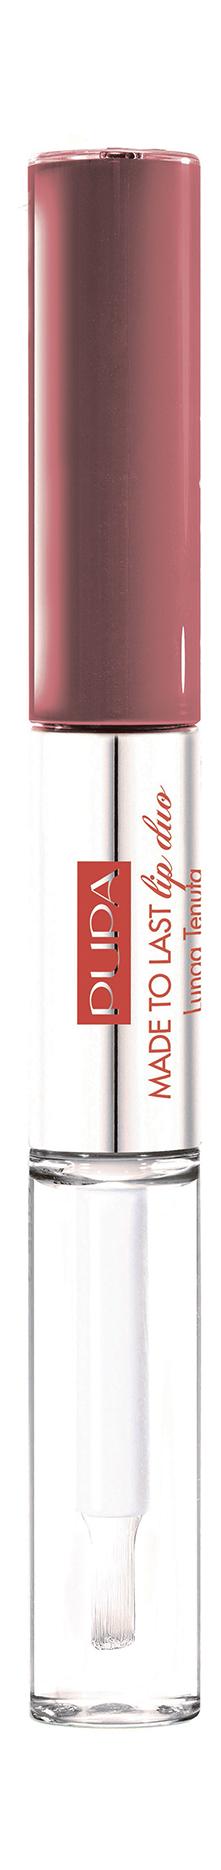 Купить Губная помада Pupa Pupa Made to Last Lip Duo 15 Nude Set